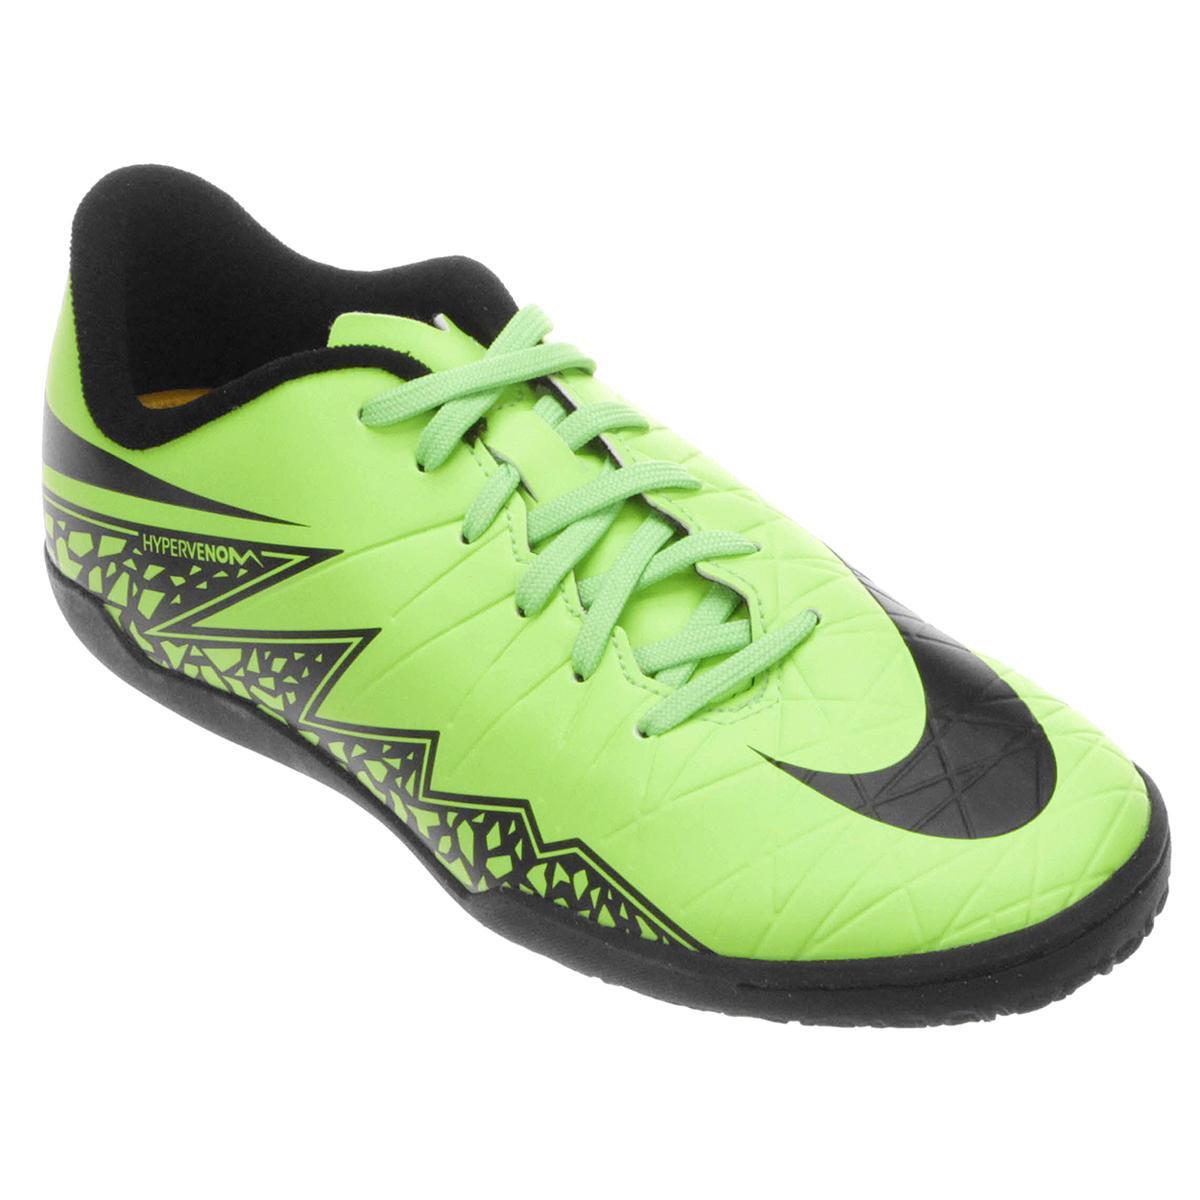 6fe9981dacb59 ... purchase o produto chuteira futsal infantil nike hypervenom phelon 2 ic  verde e preto acabou.